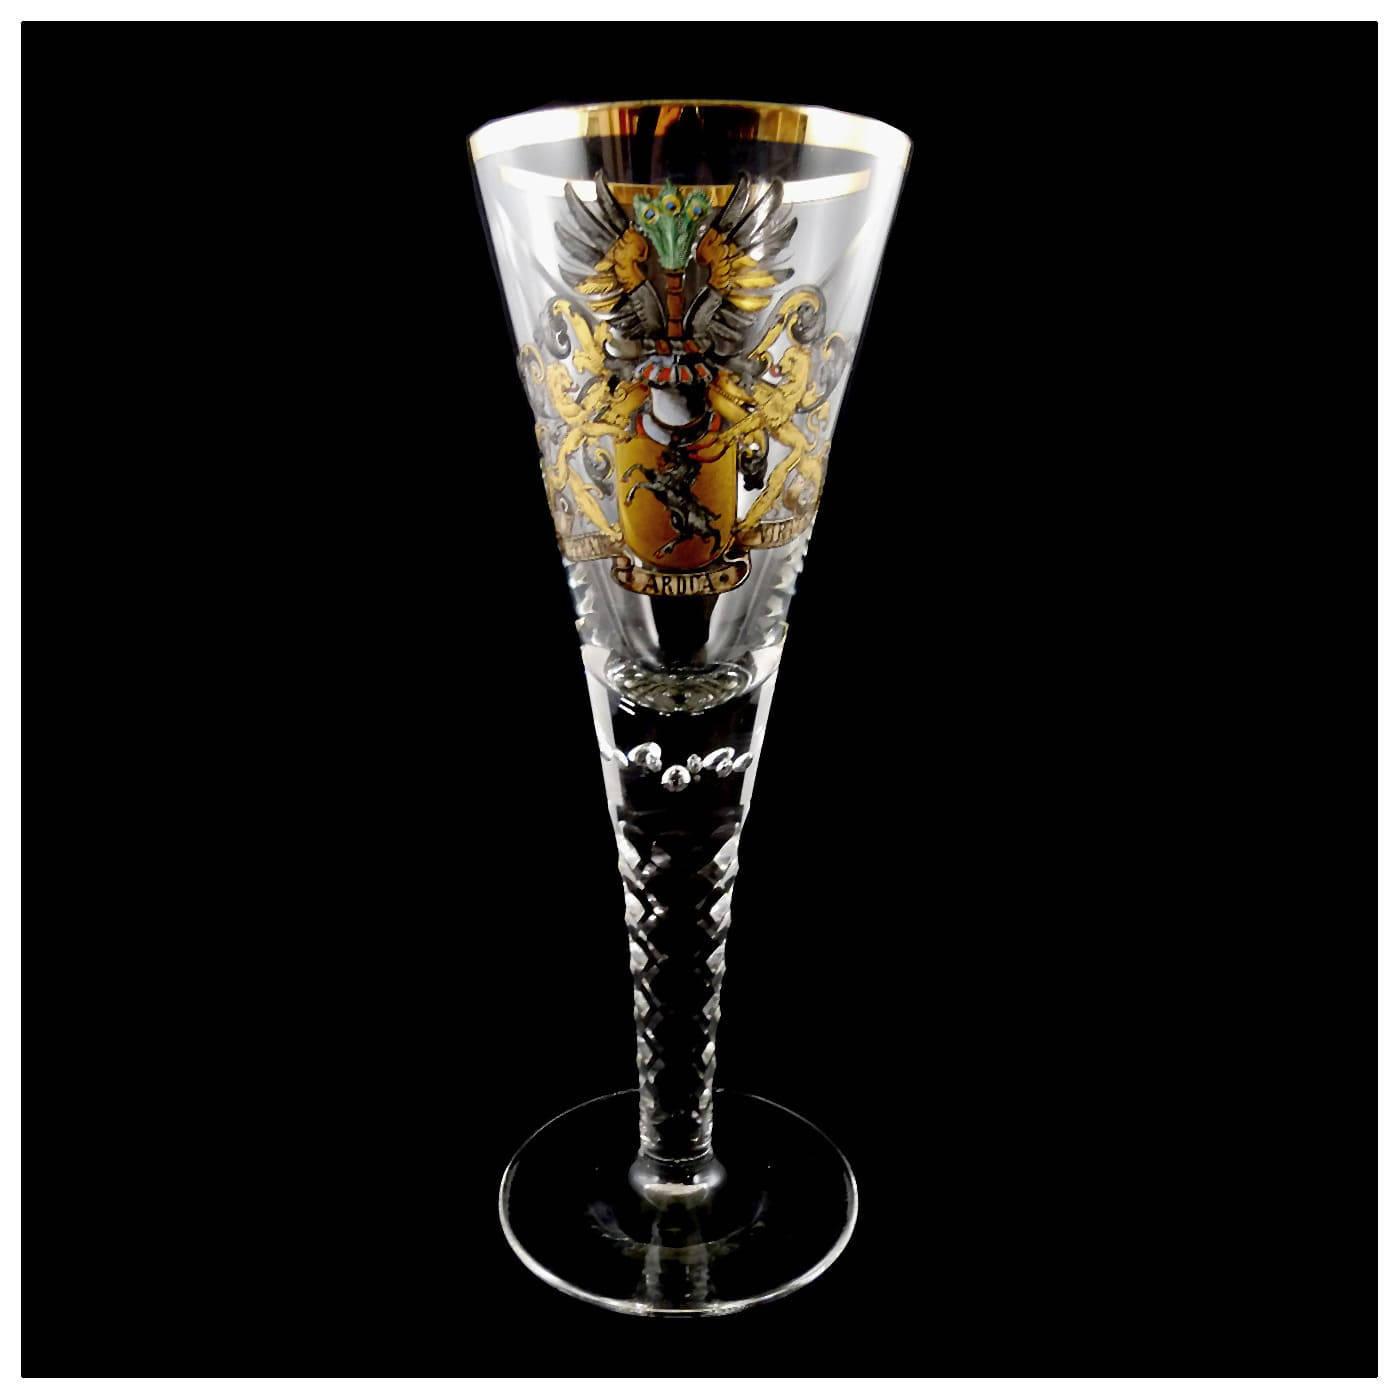 pokale kelchgl ser antikes glas neuwirth glas aus dem 18 jh 19 jh und 20 jh. Black Bedroom Furniture Sets. Home Design Ideas